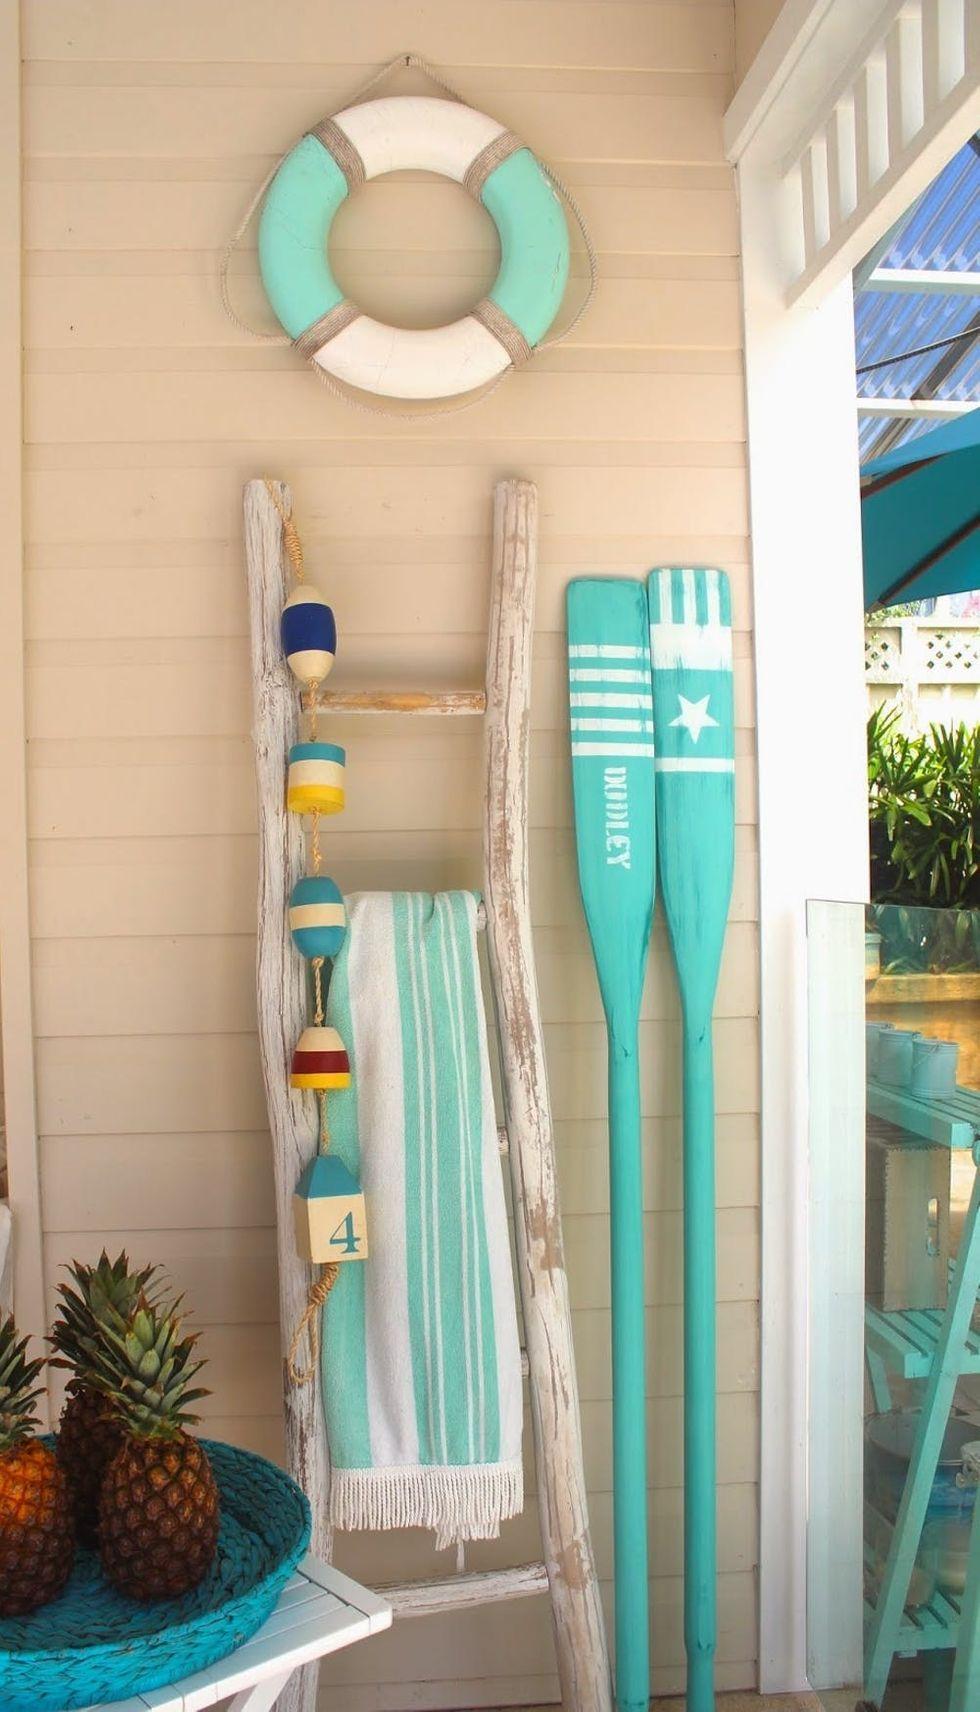 Photo of 24 Door Decor Ideas to Rock This Summer